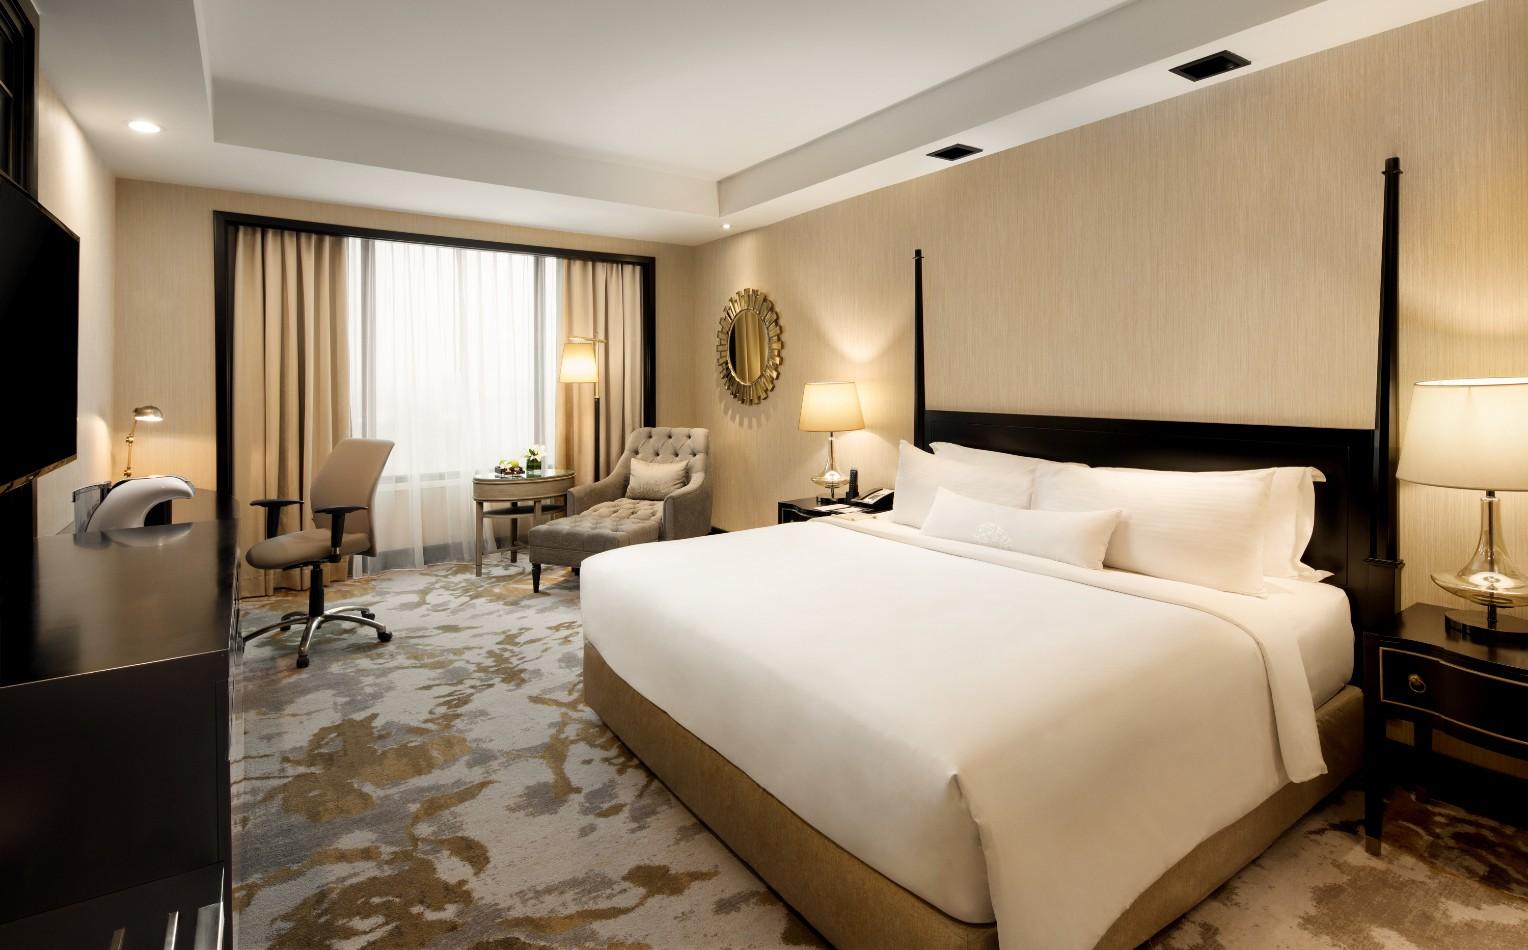 Murah Banget Promo Hotel Domestik Book Now Stay Later Juli 2020 Wego Indonesia Travel Blog